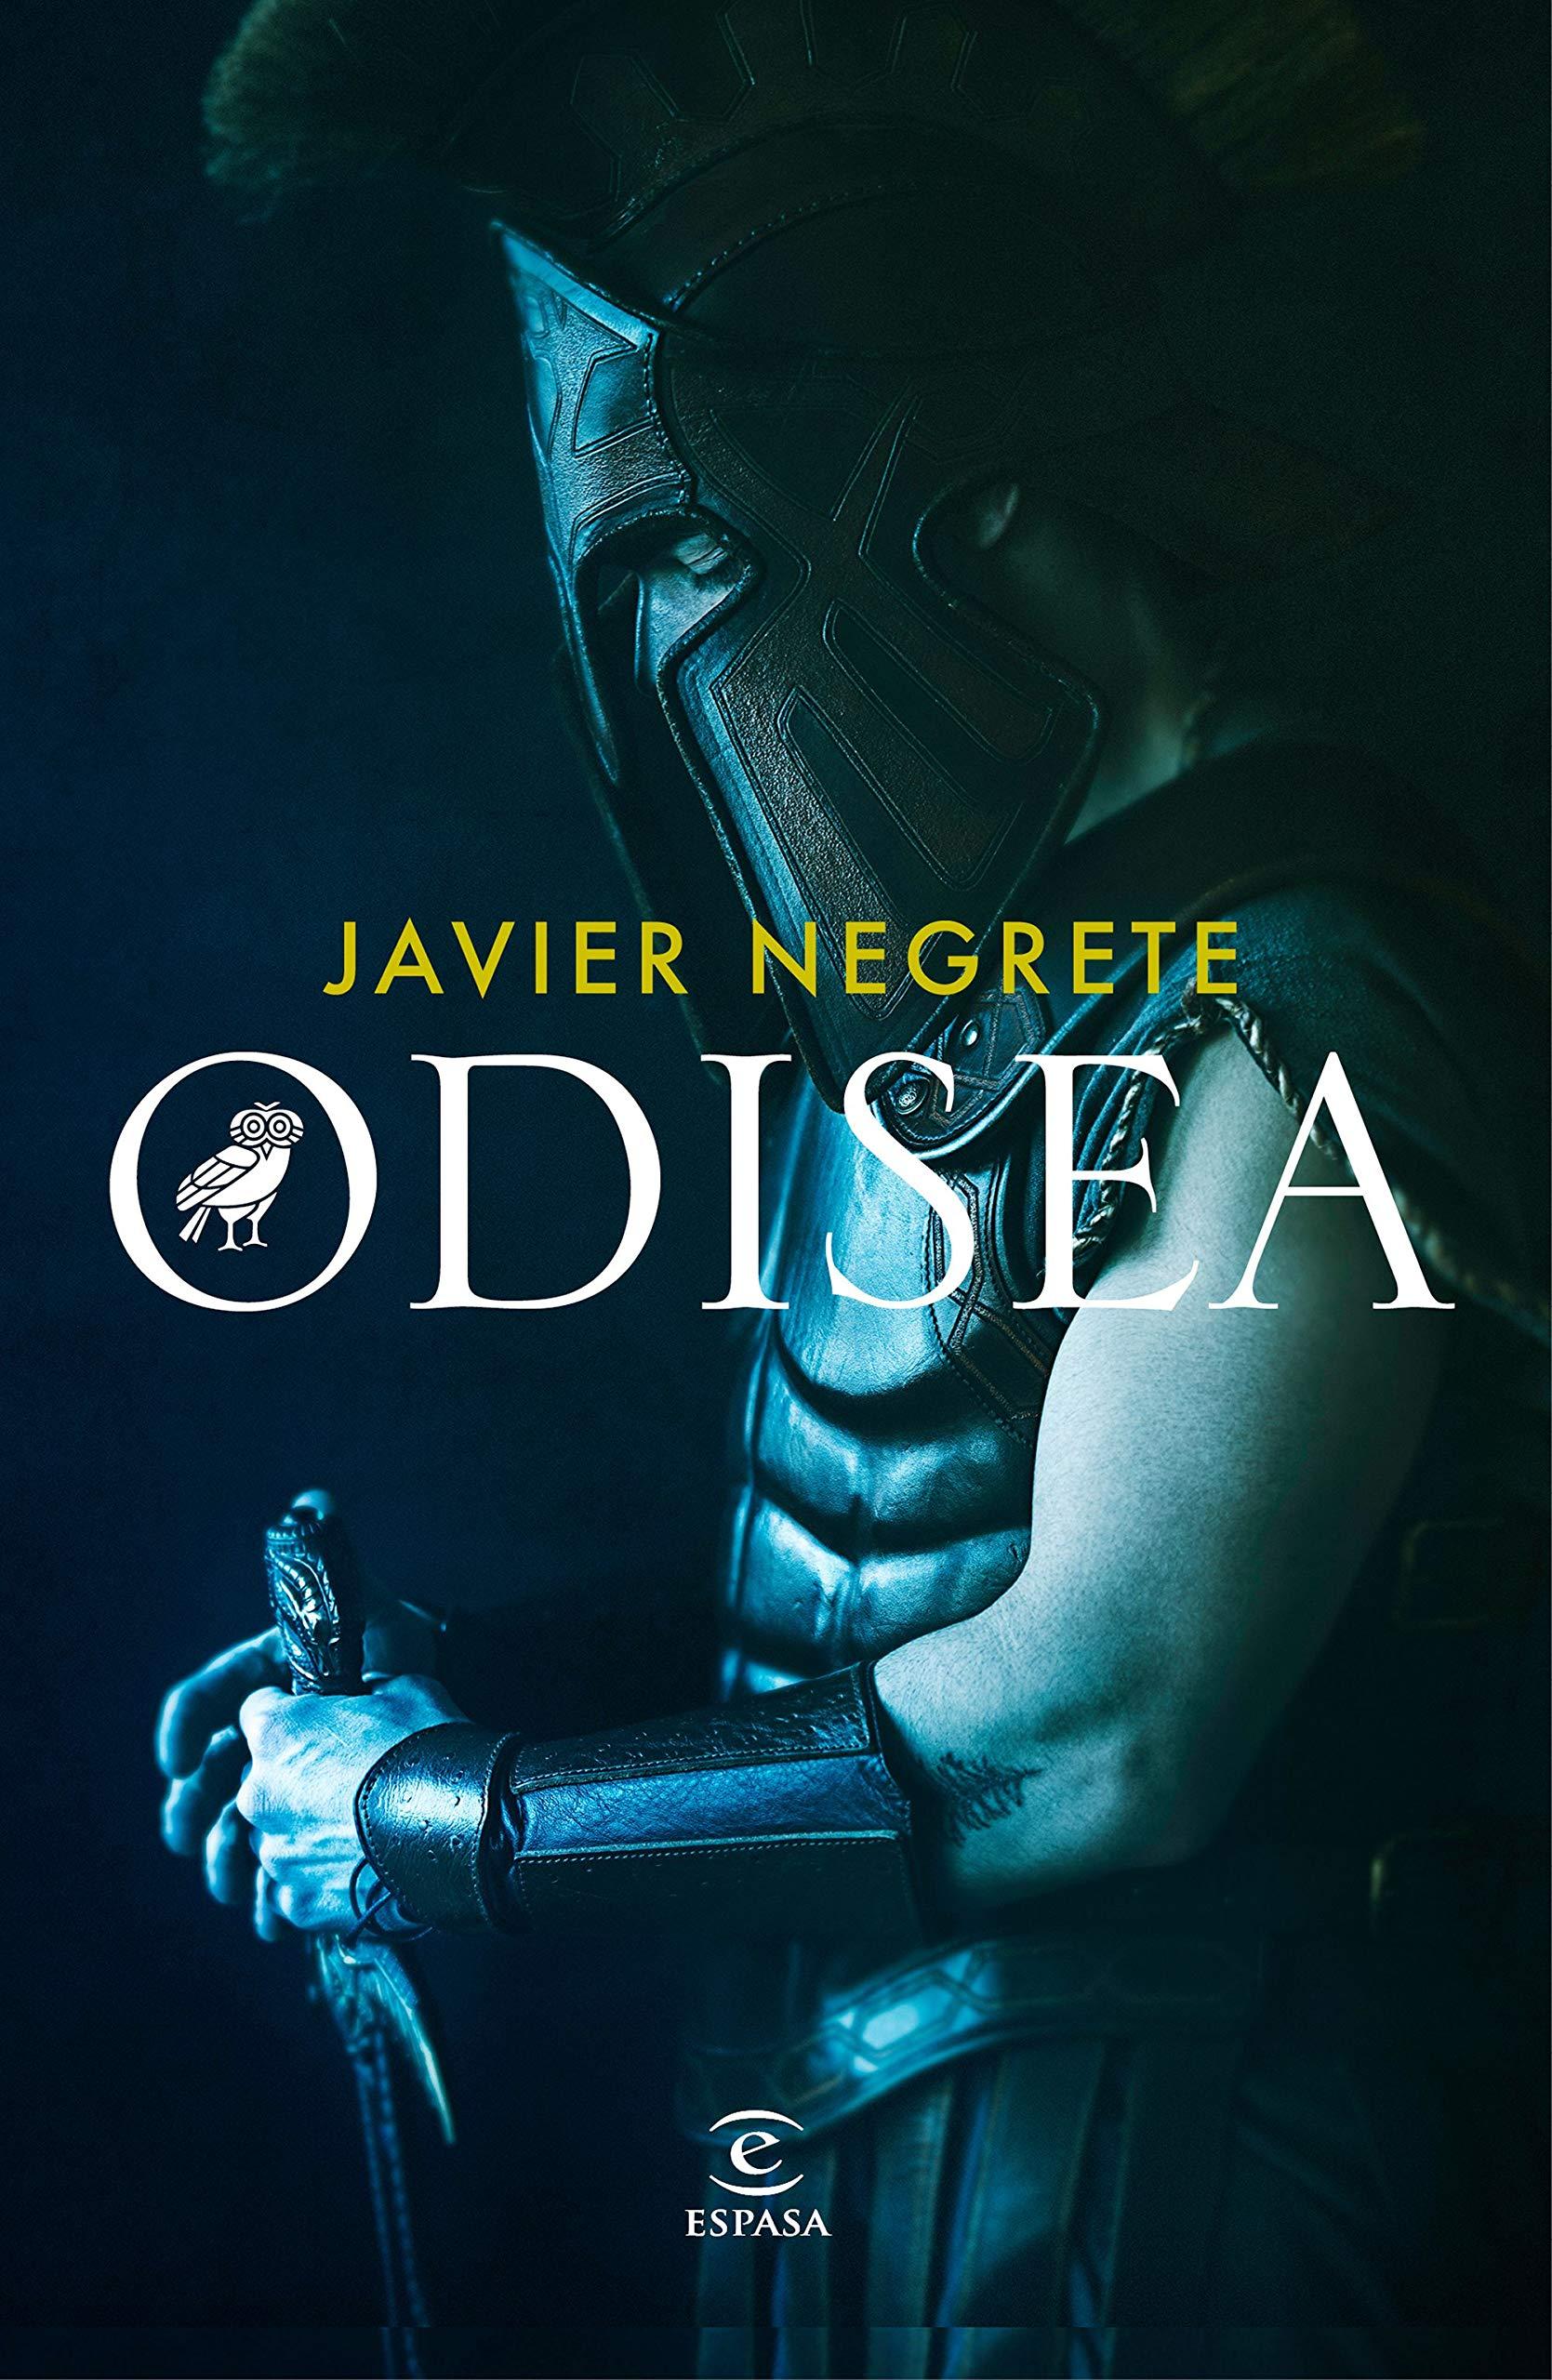 Odisea (ESPASA NARRATIVA): Amazon.es: Javier Negrete: Libros